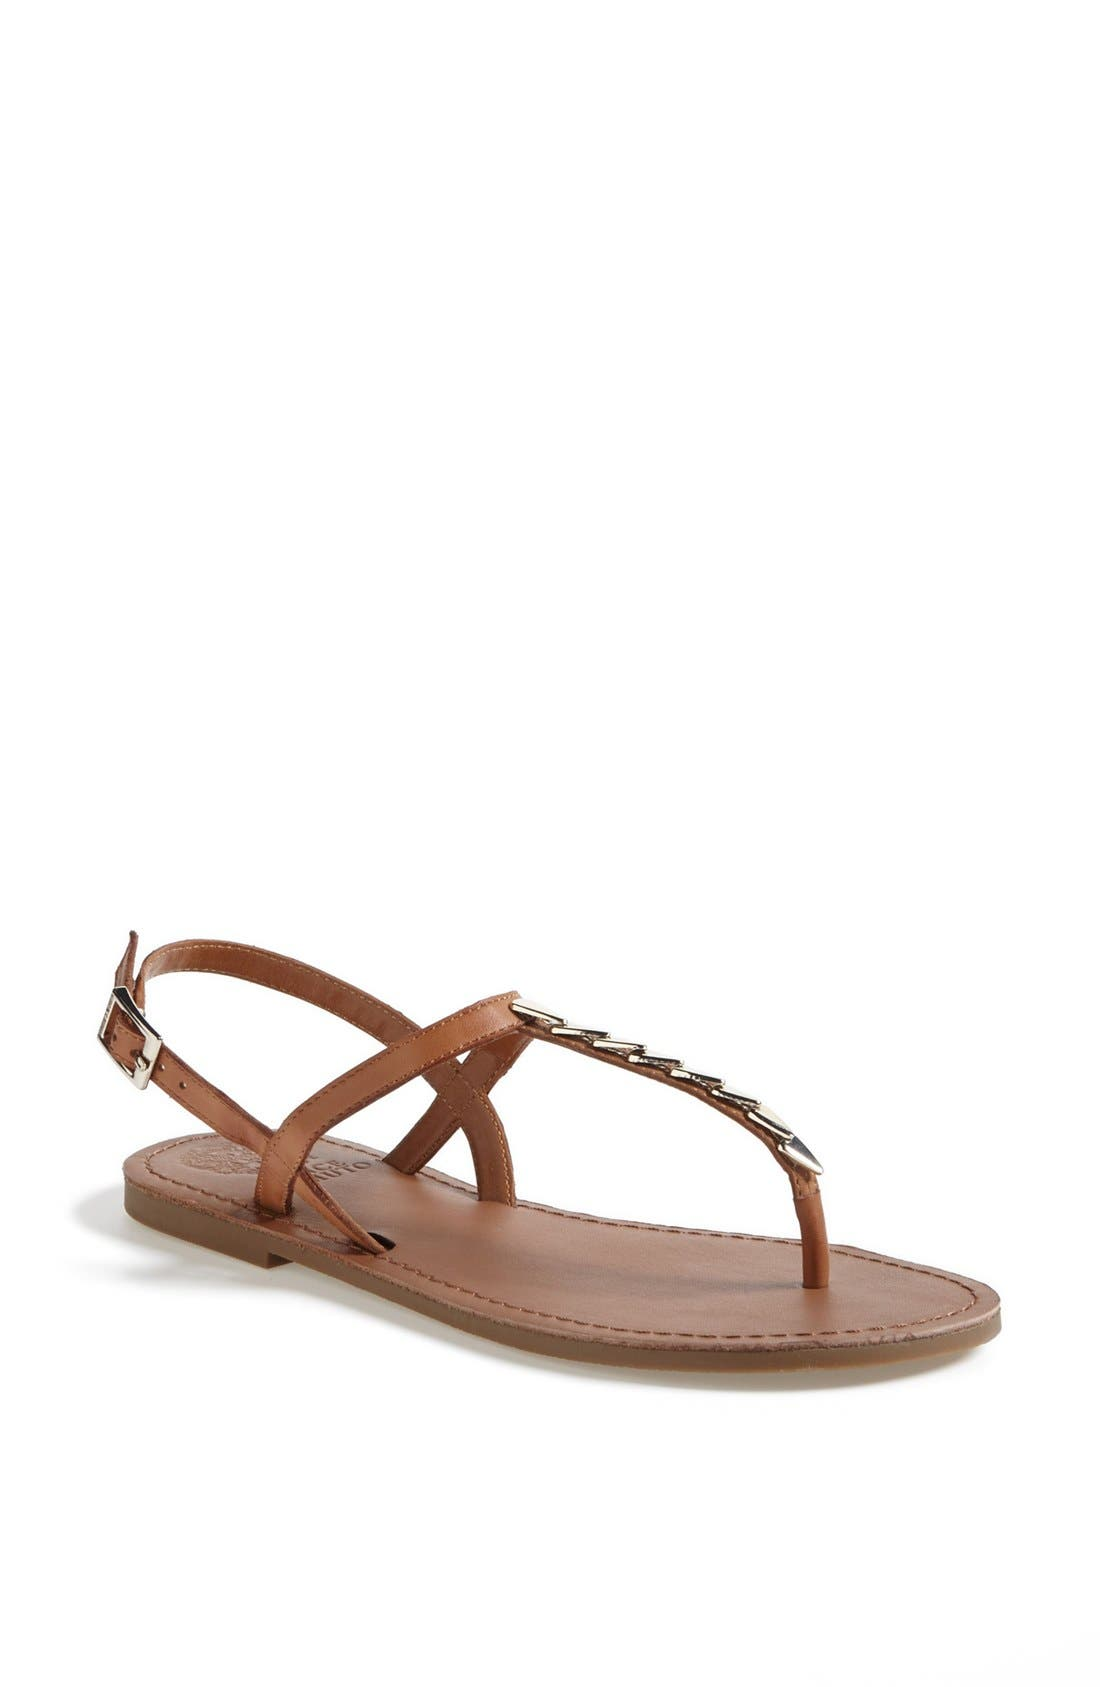 Alternate Image 1 Selected - Vince Camuto 'Illison' Sandal